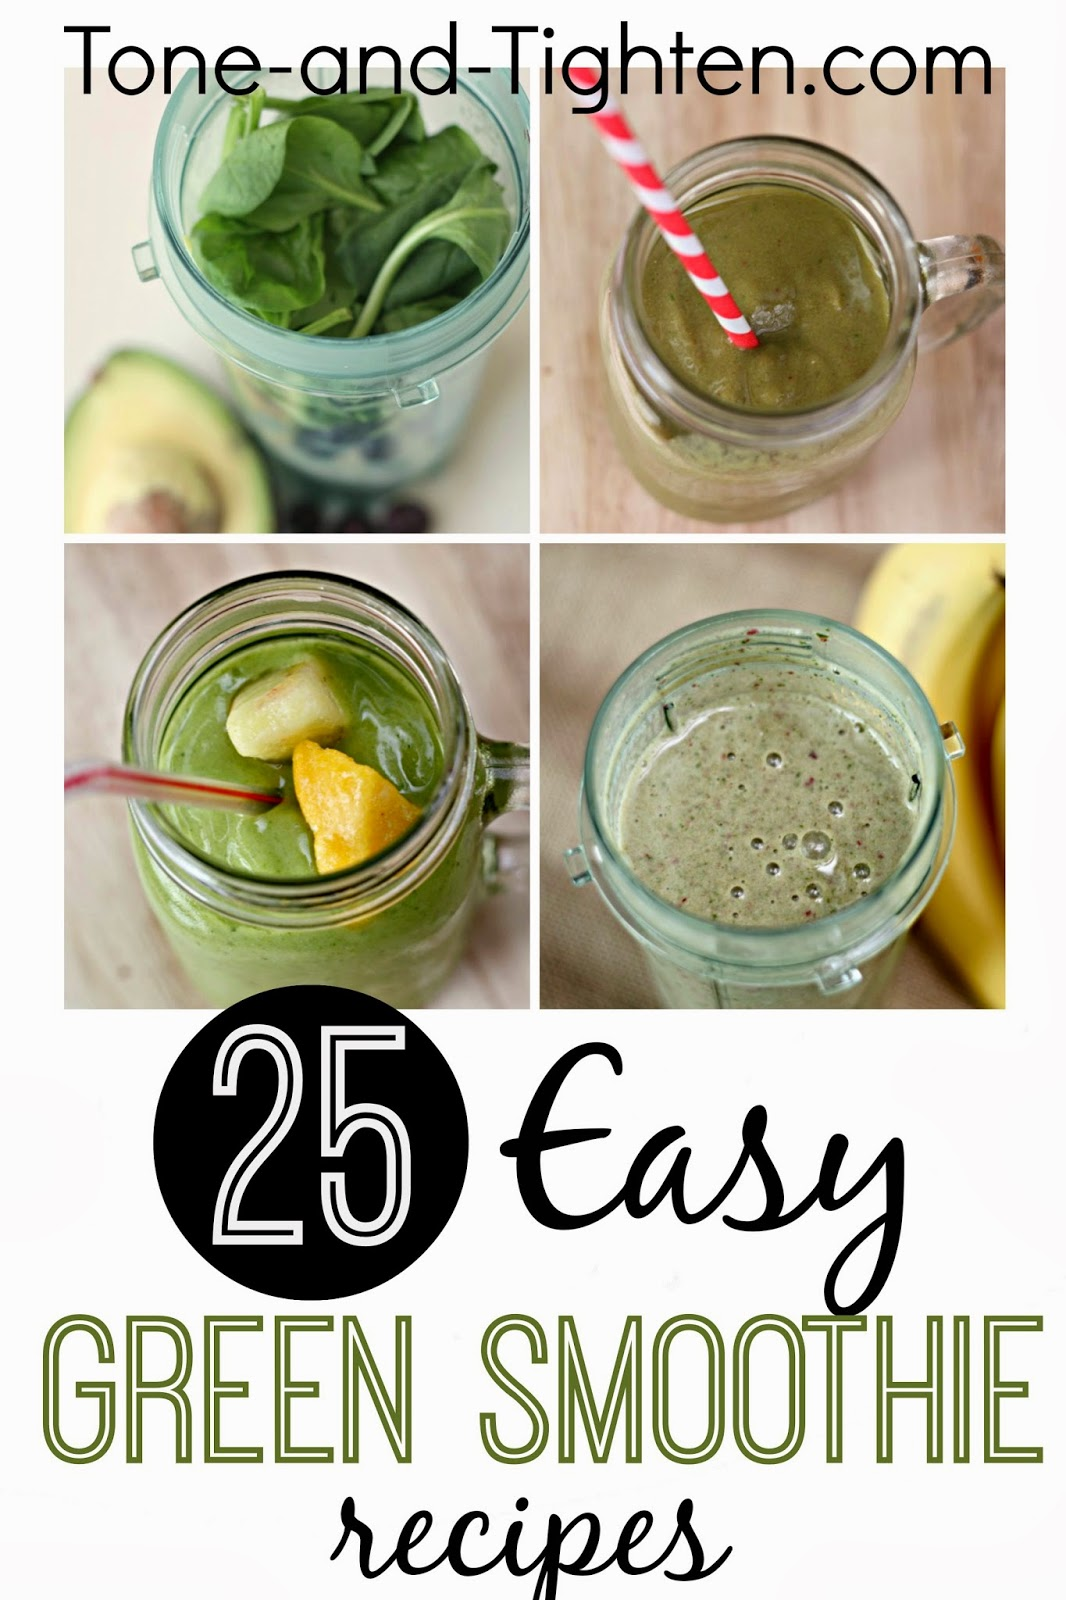 Blueberry Avocado Green Smoothie Recipe Tone And Tighten